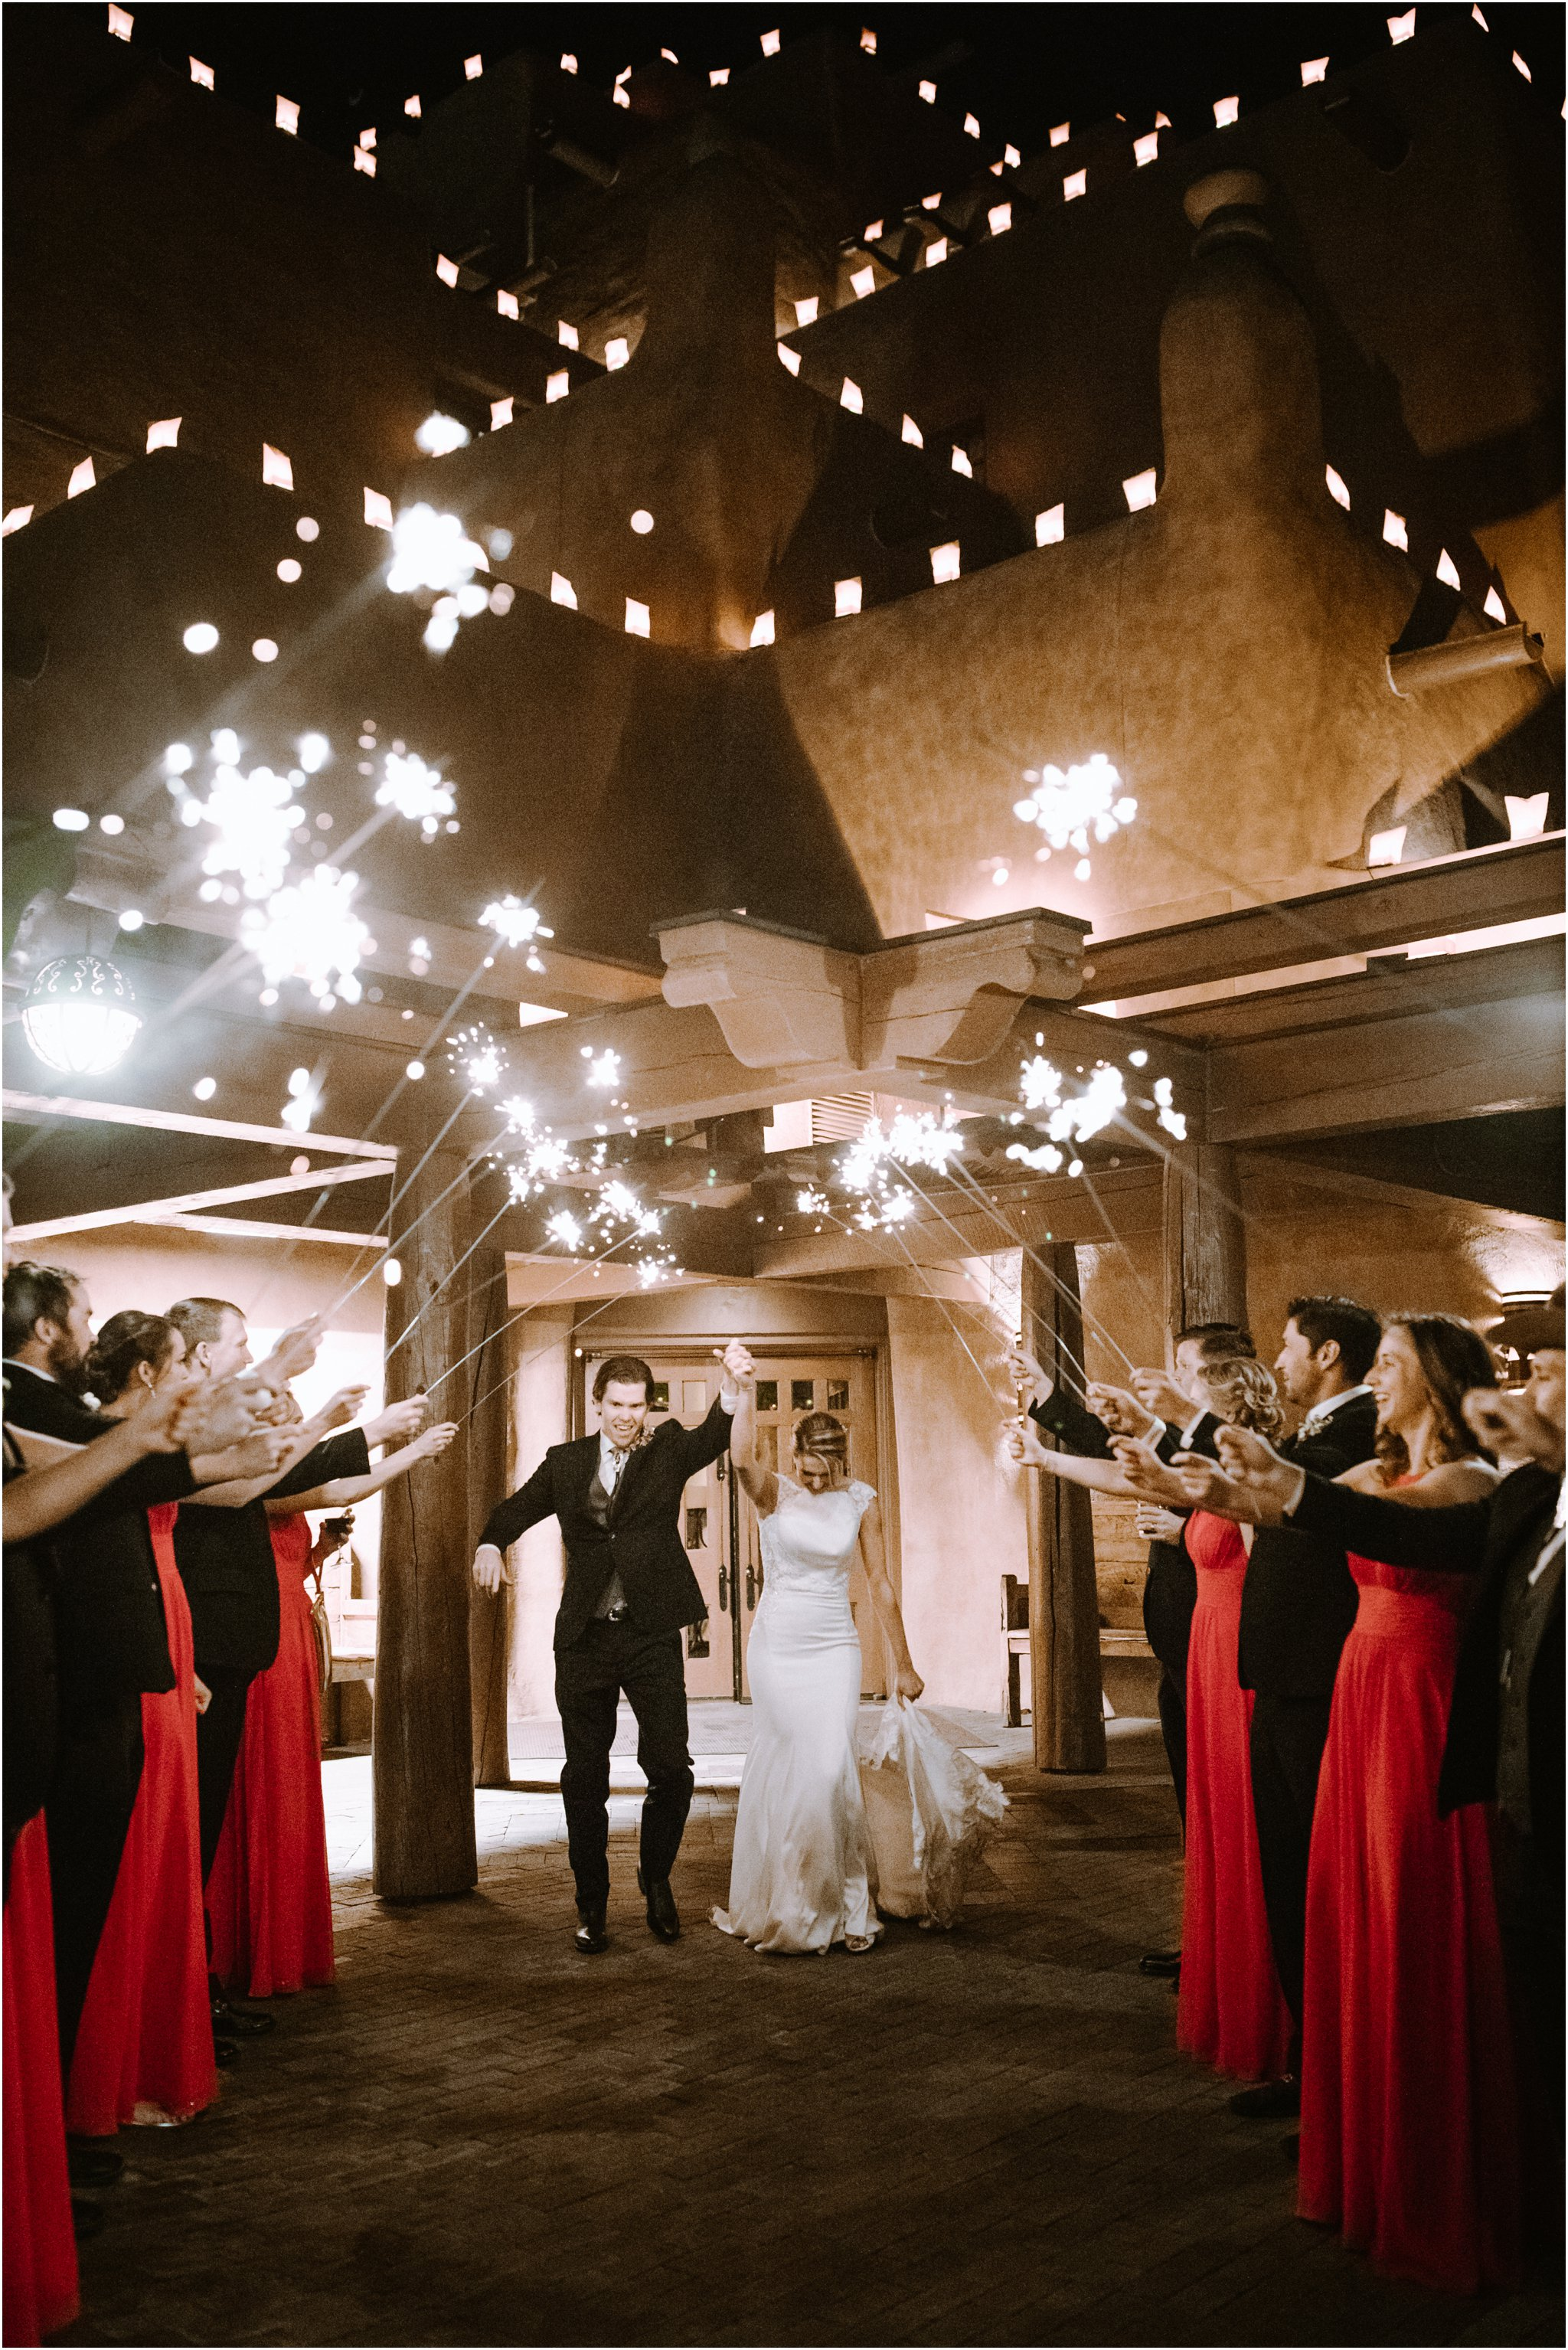 0948Loretto Chapel Wedding, Inn and Spa at Loretto wedding, Santa Fe wedding photographers, blue rose photography